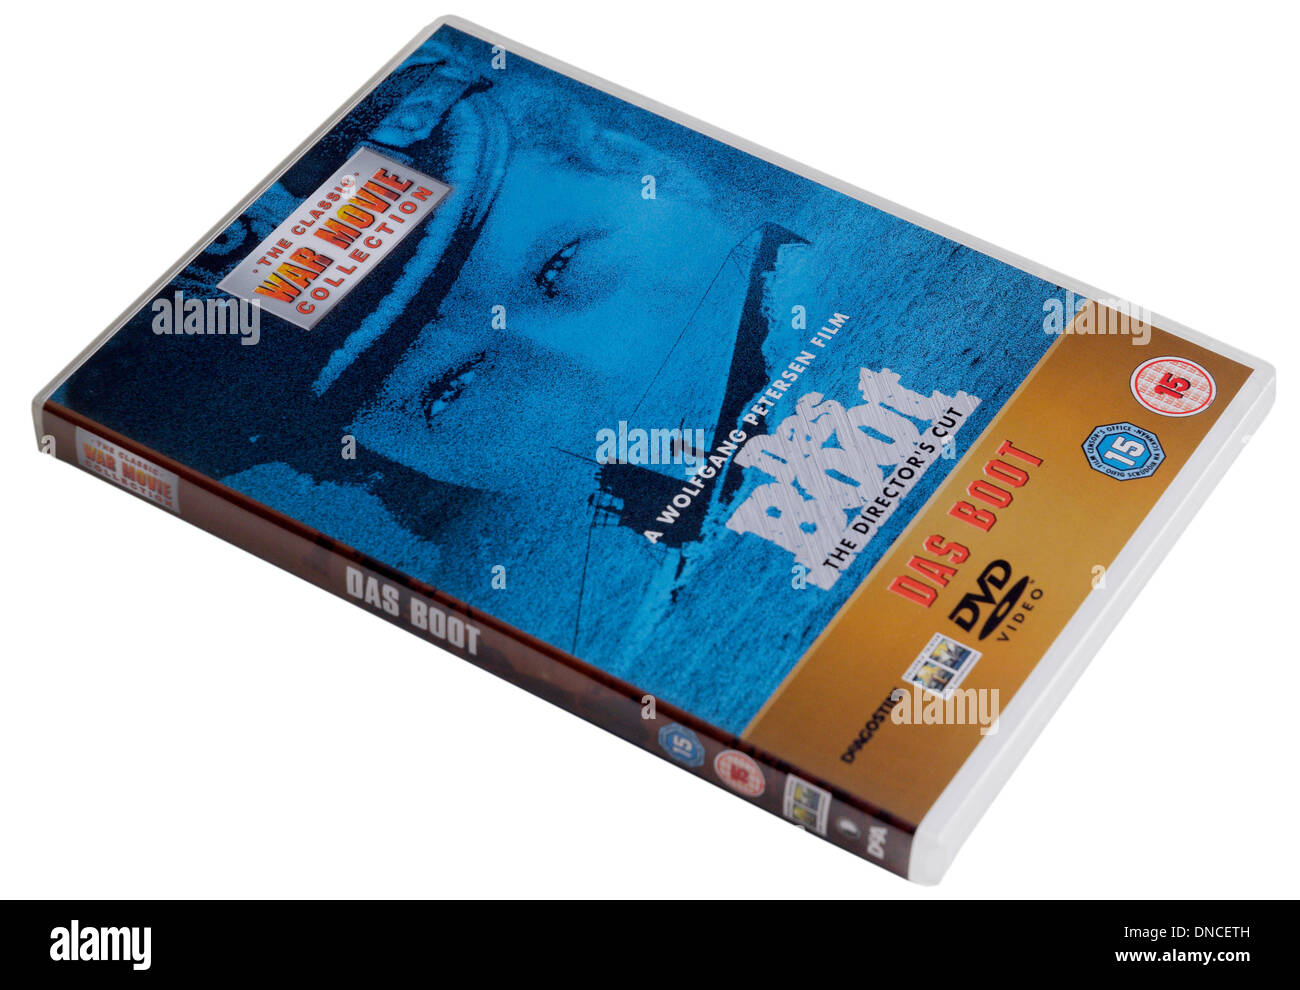 Das Boot DVD Imagen De Stock